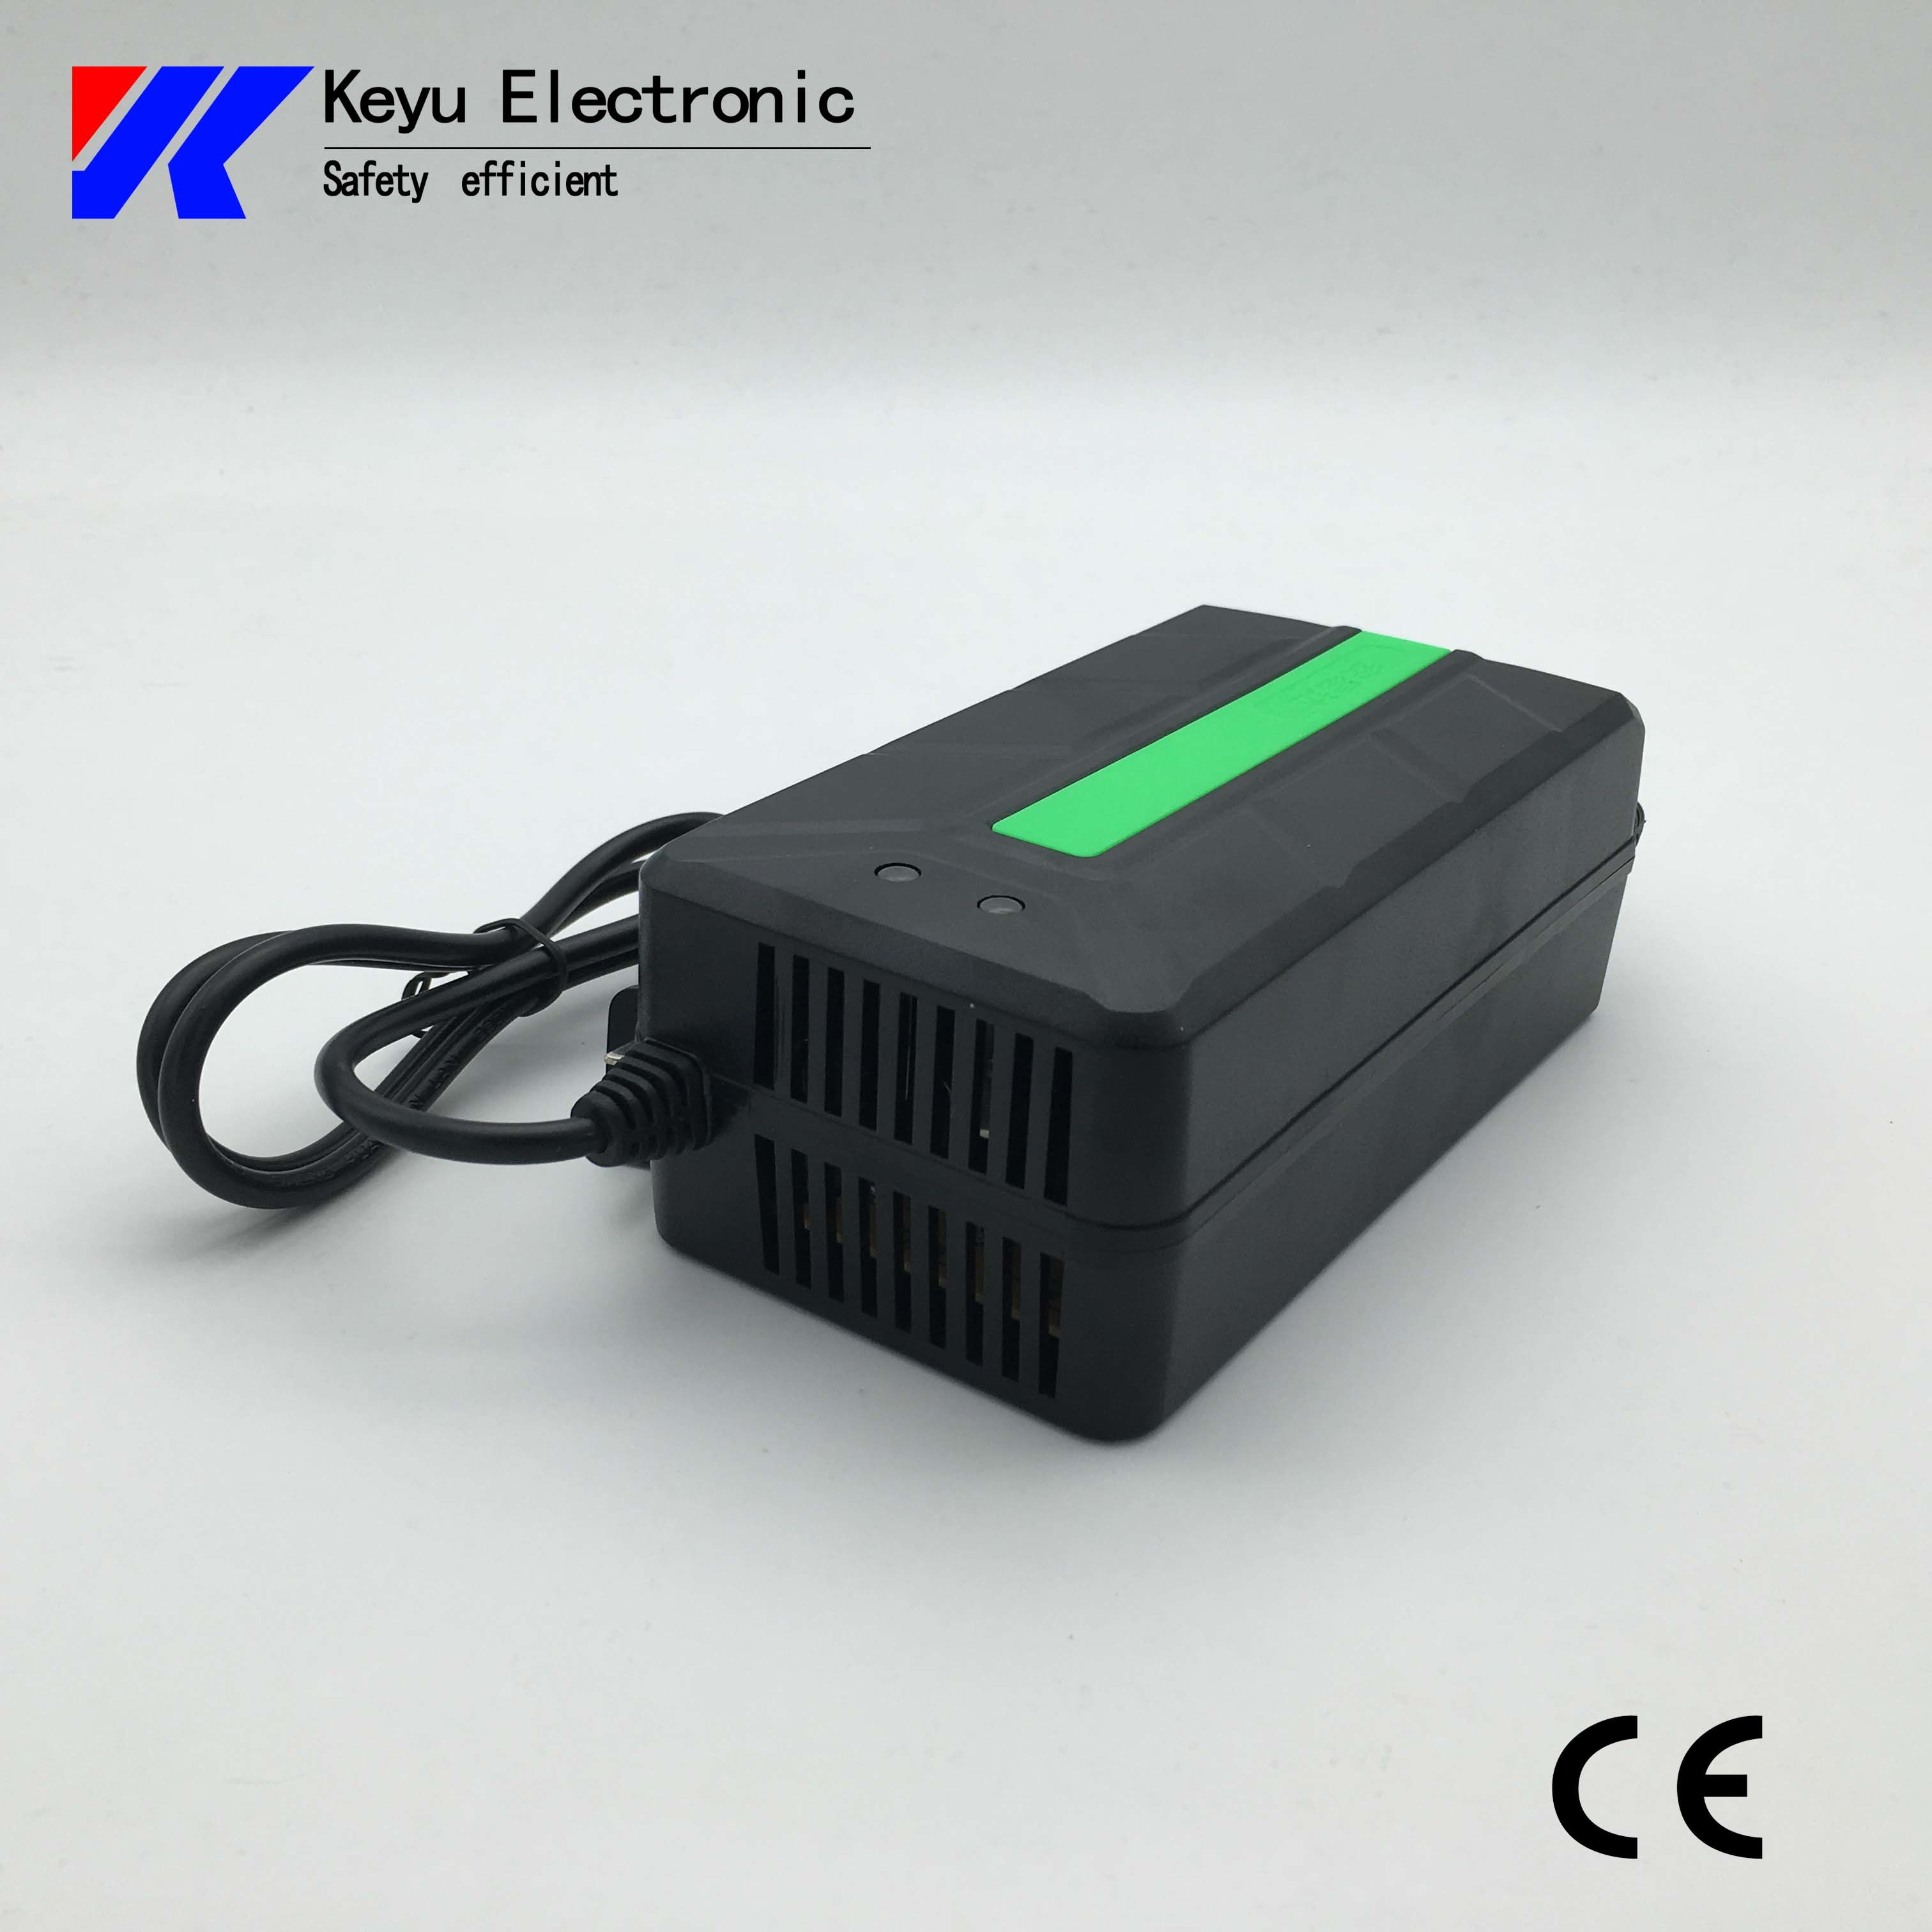 Anyida Ebike Charger 48V-20ah (Lead Acid battery)